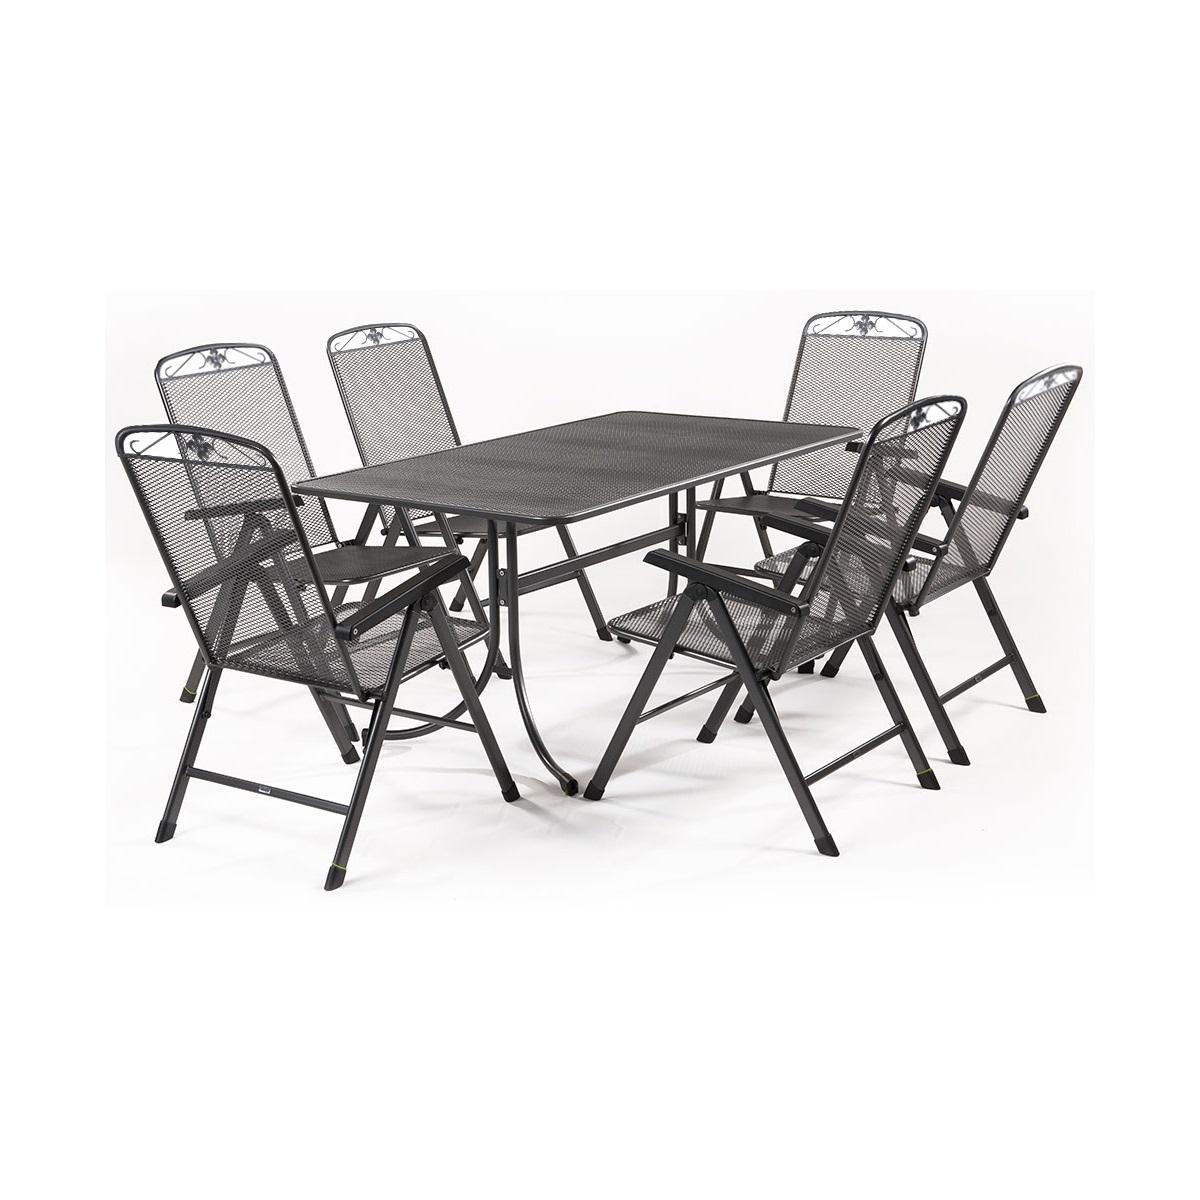 Sestava nábytku z tahokovu (6x pol. křeslo Savoy, 1x stůl Universal 160) MWH Basanis 6+